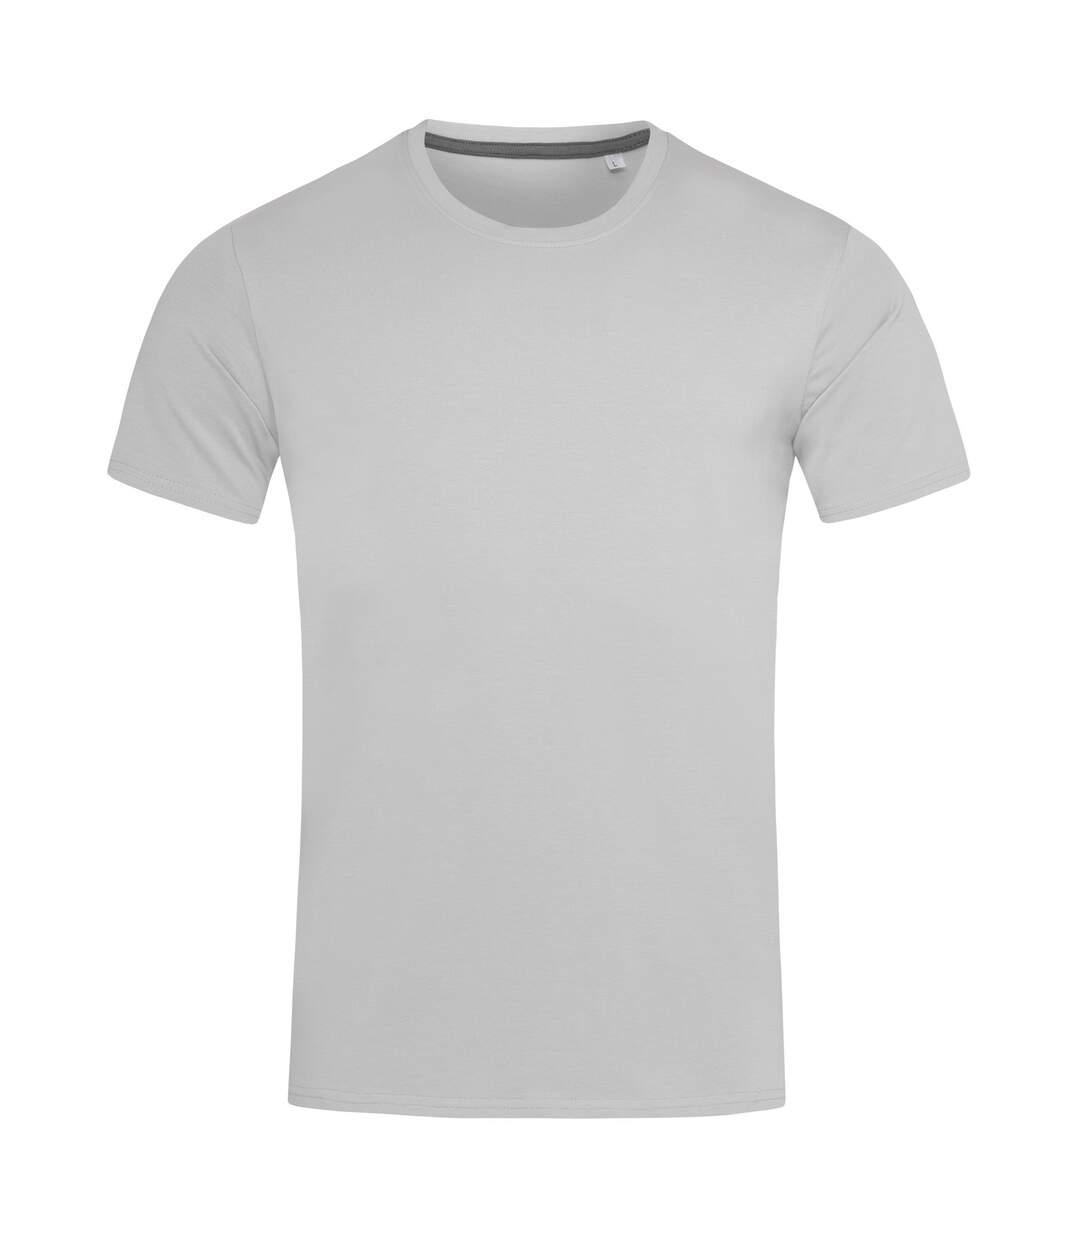 Stedman Stars Mens Clive Crew Neck Tee (Soft Grey) - UTAB384